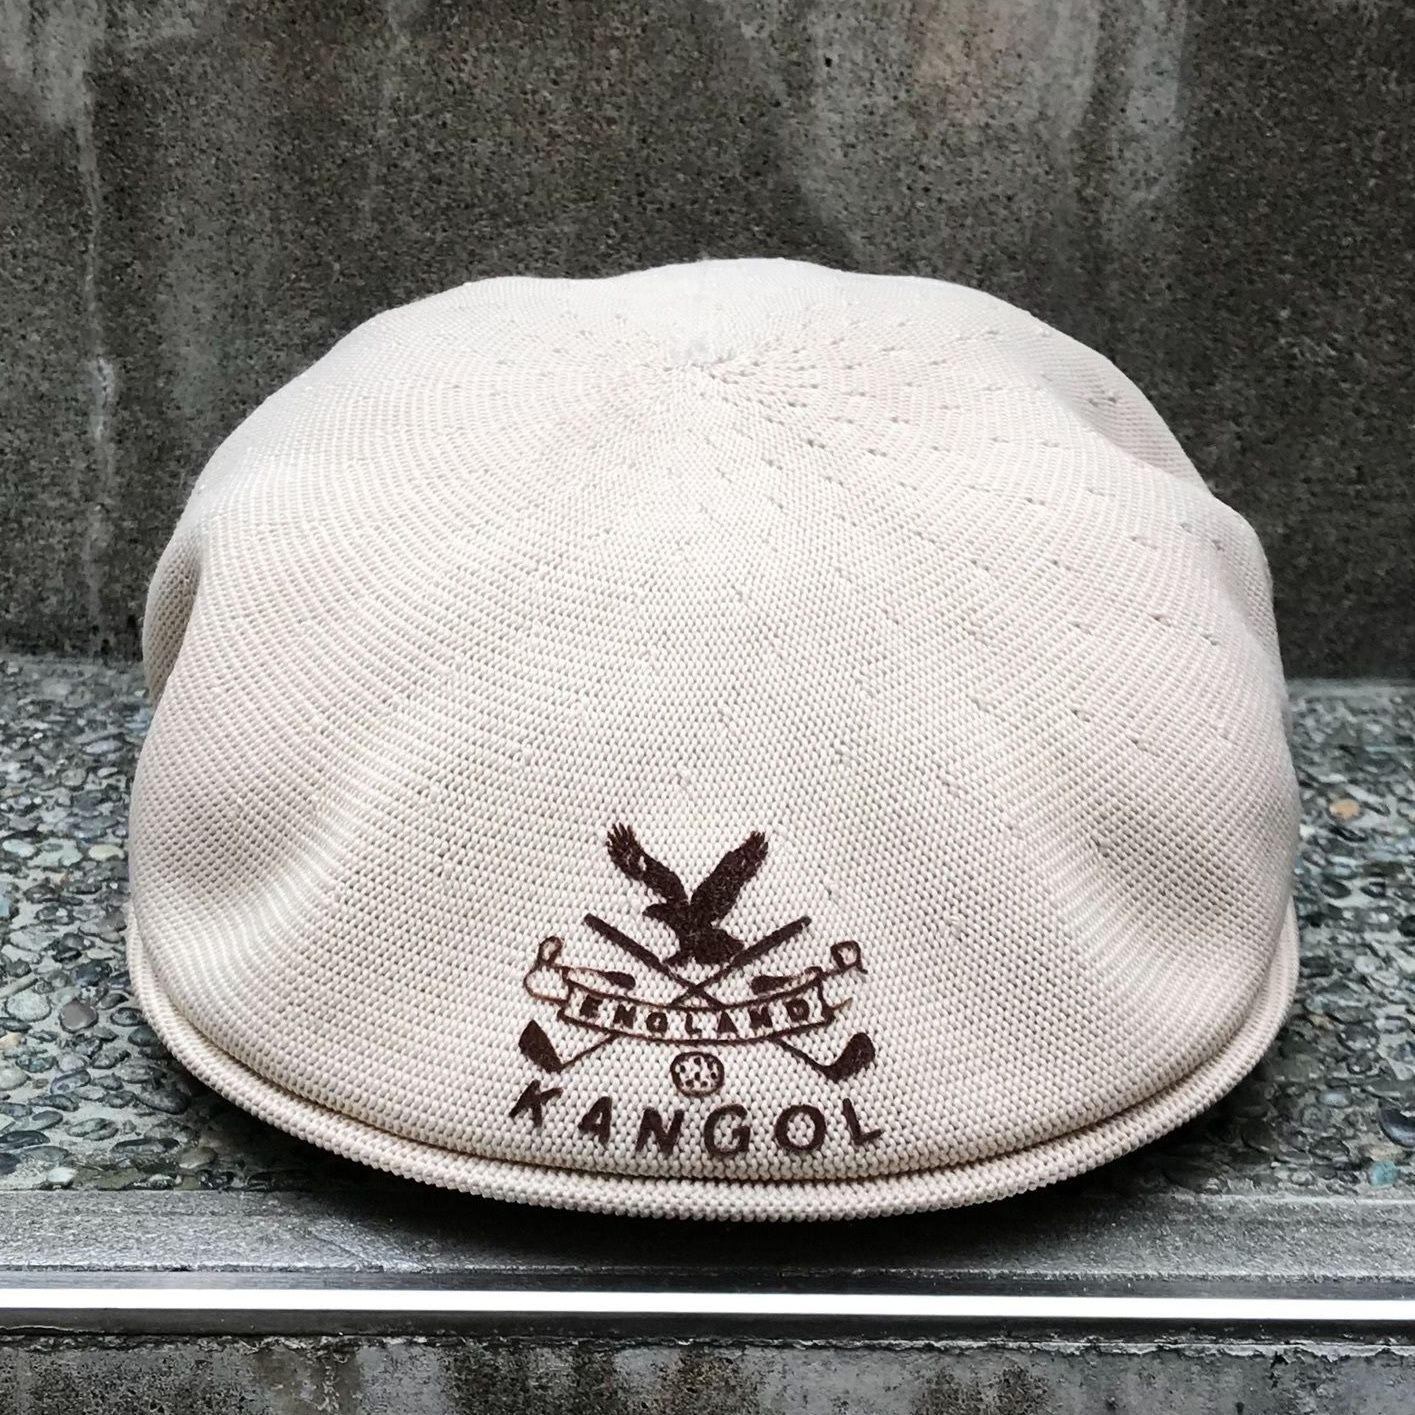 KANGOL/カンゴール Tropic504 ハンチング Made In ENGLAND (USED)